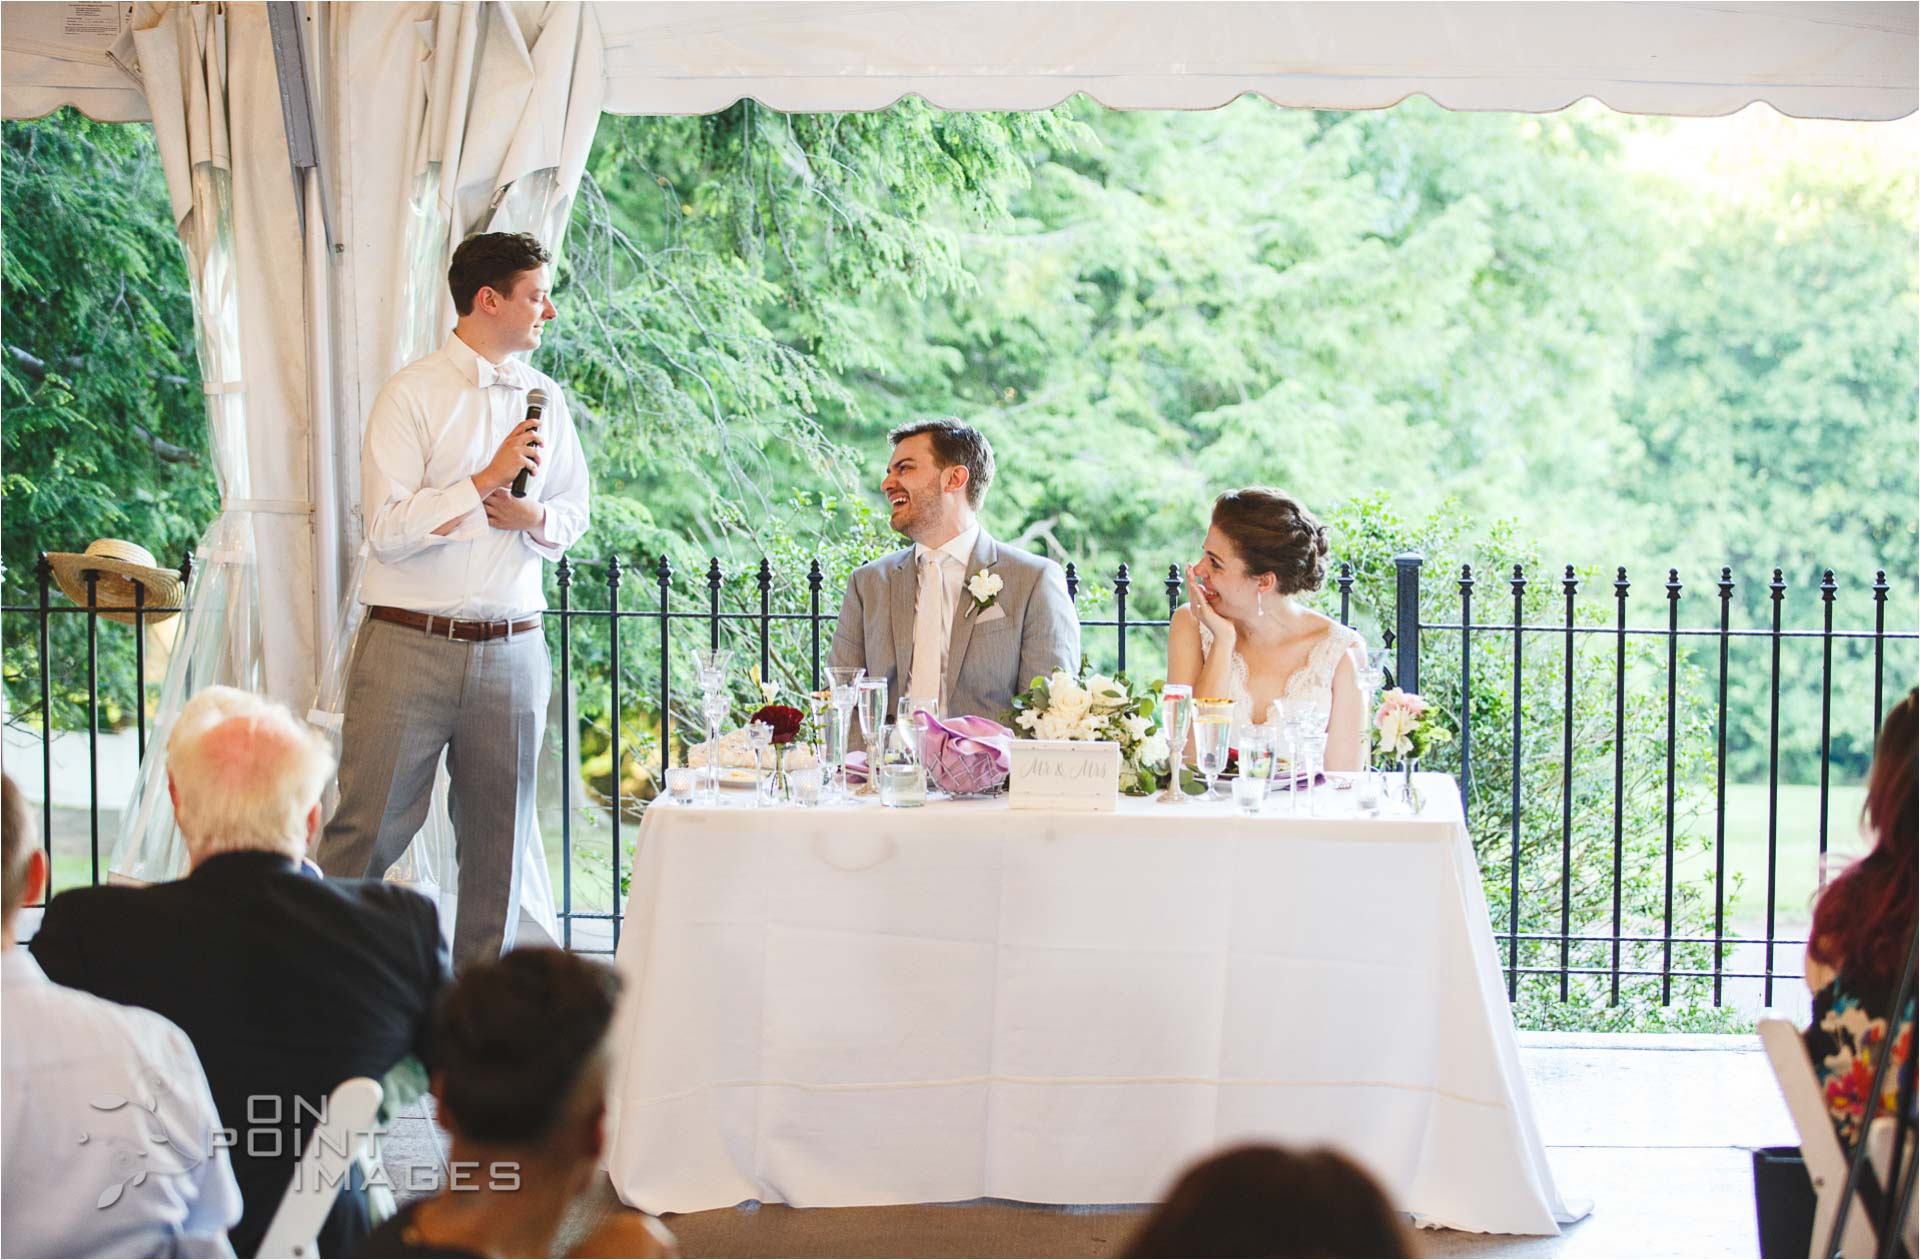 wickham-park-wedding-photographer-ct-32.jpg